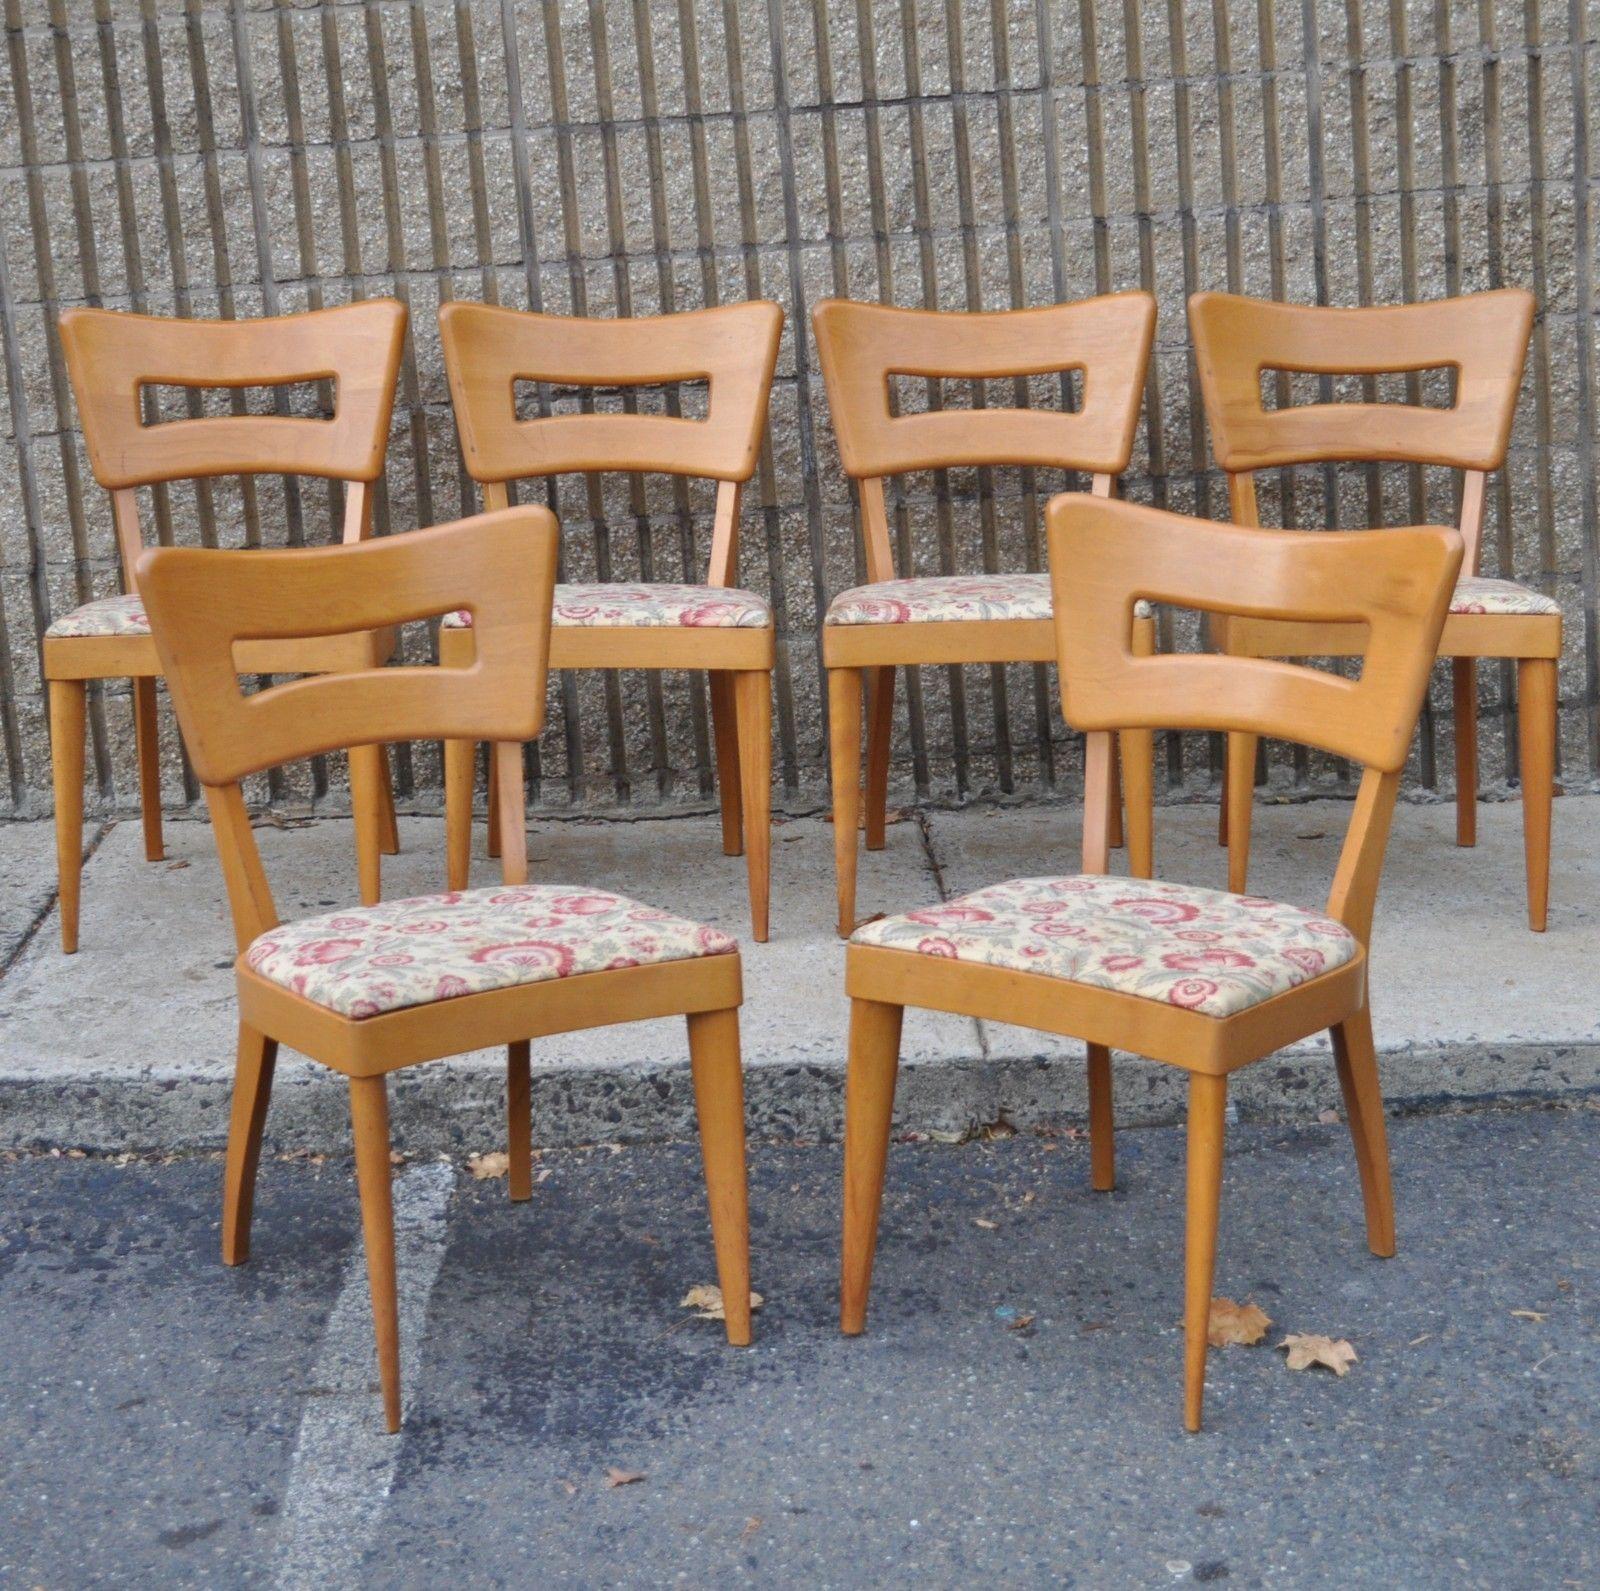 heywood wakefield dogbone chairs beach chair tommy bahama 6 vintage m154 dining mid century vtg champagne modern ebay